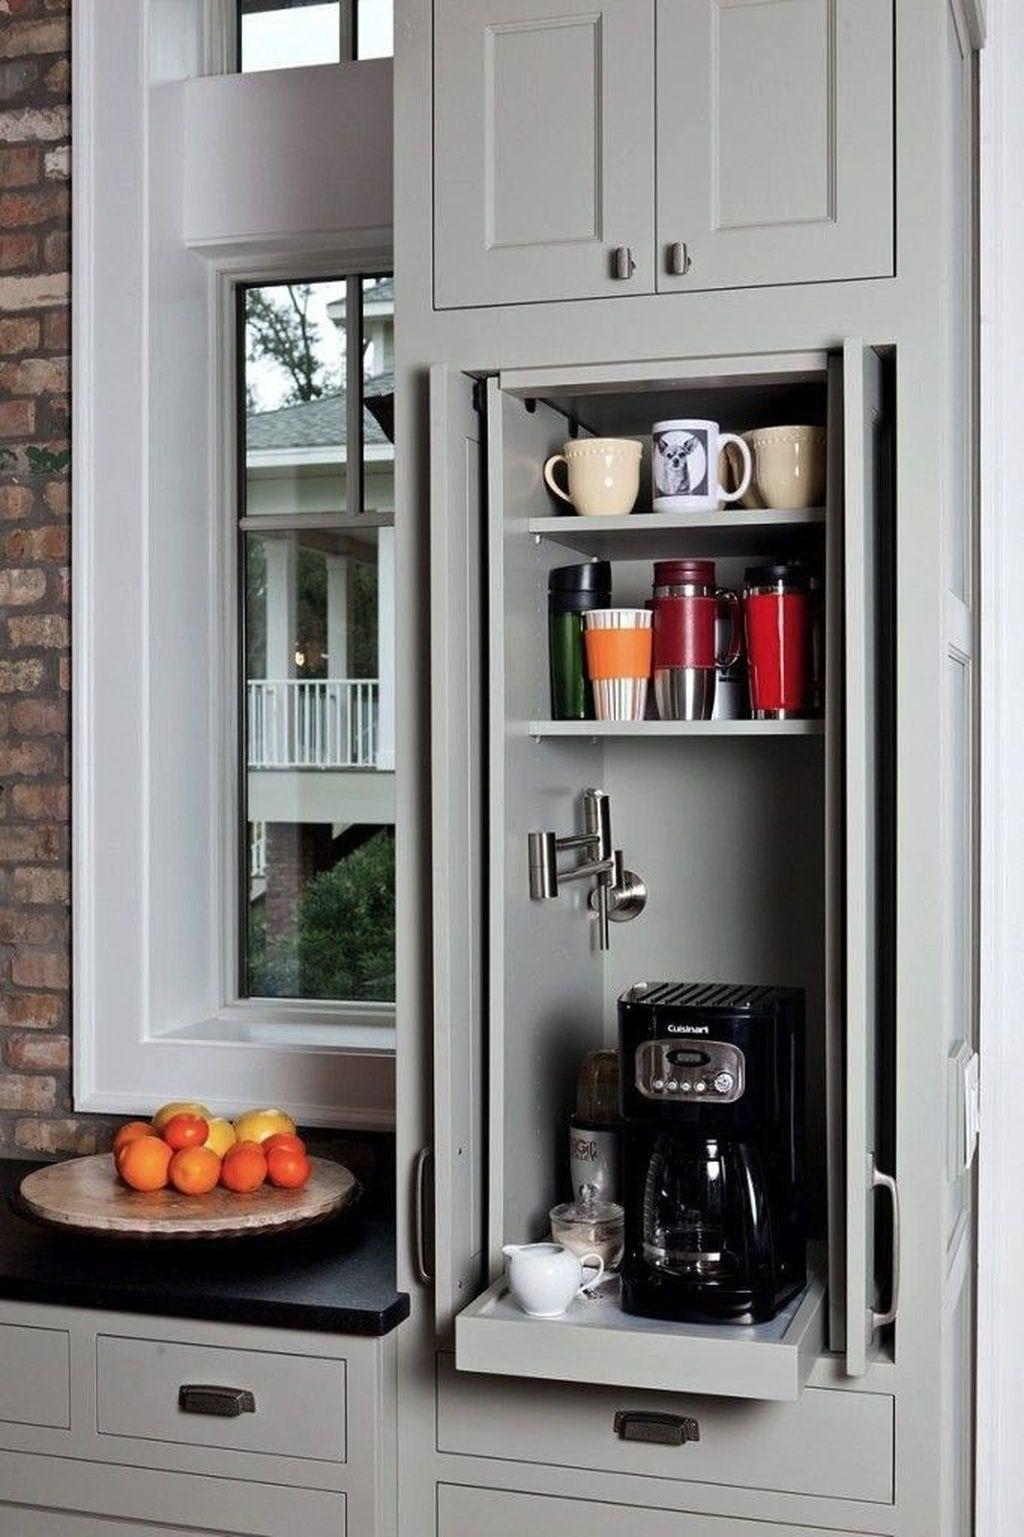 50 great coffee cabinet organization ideas kitchen remodel sweet home home decor on kitchen decor organization id=69233